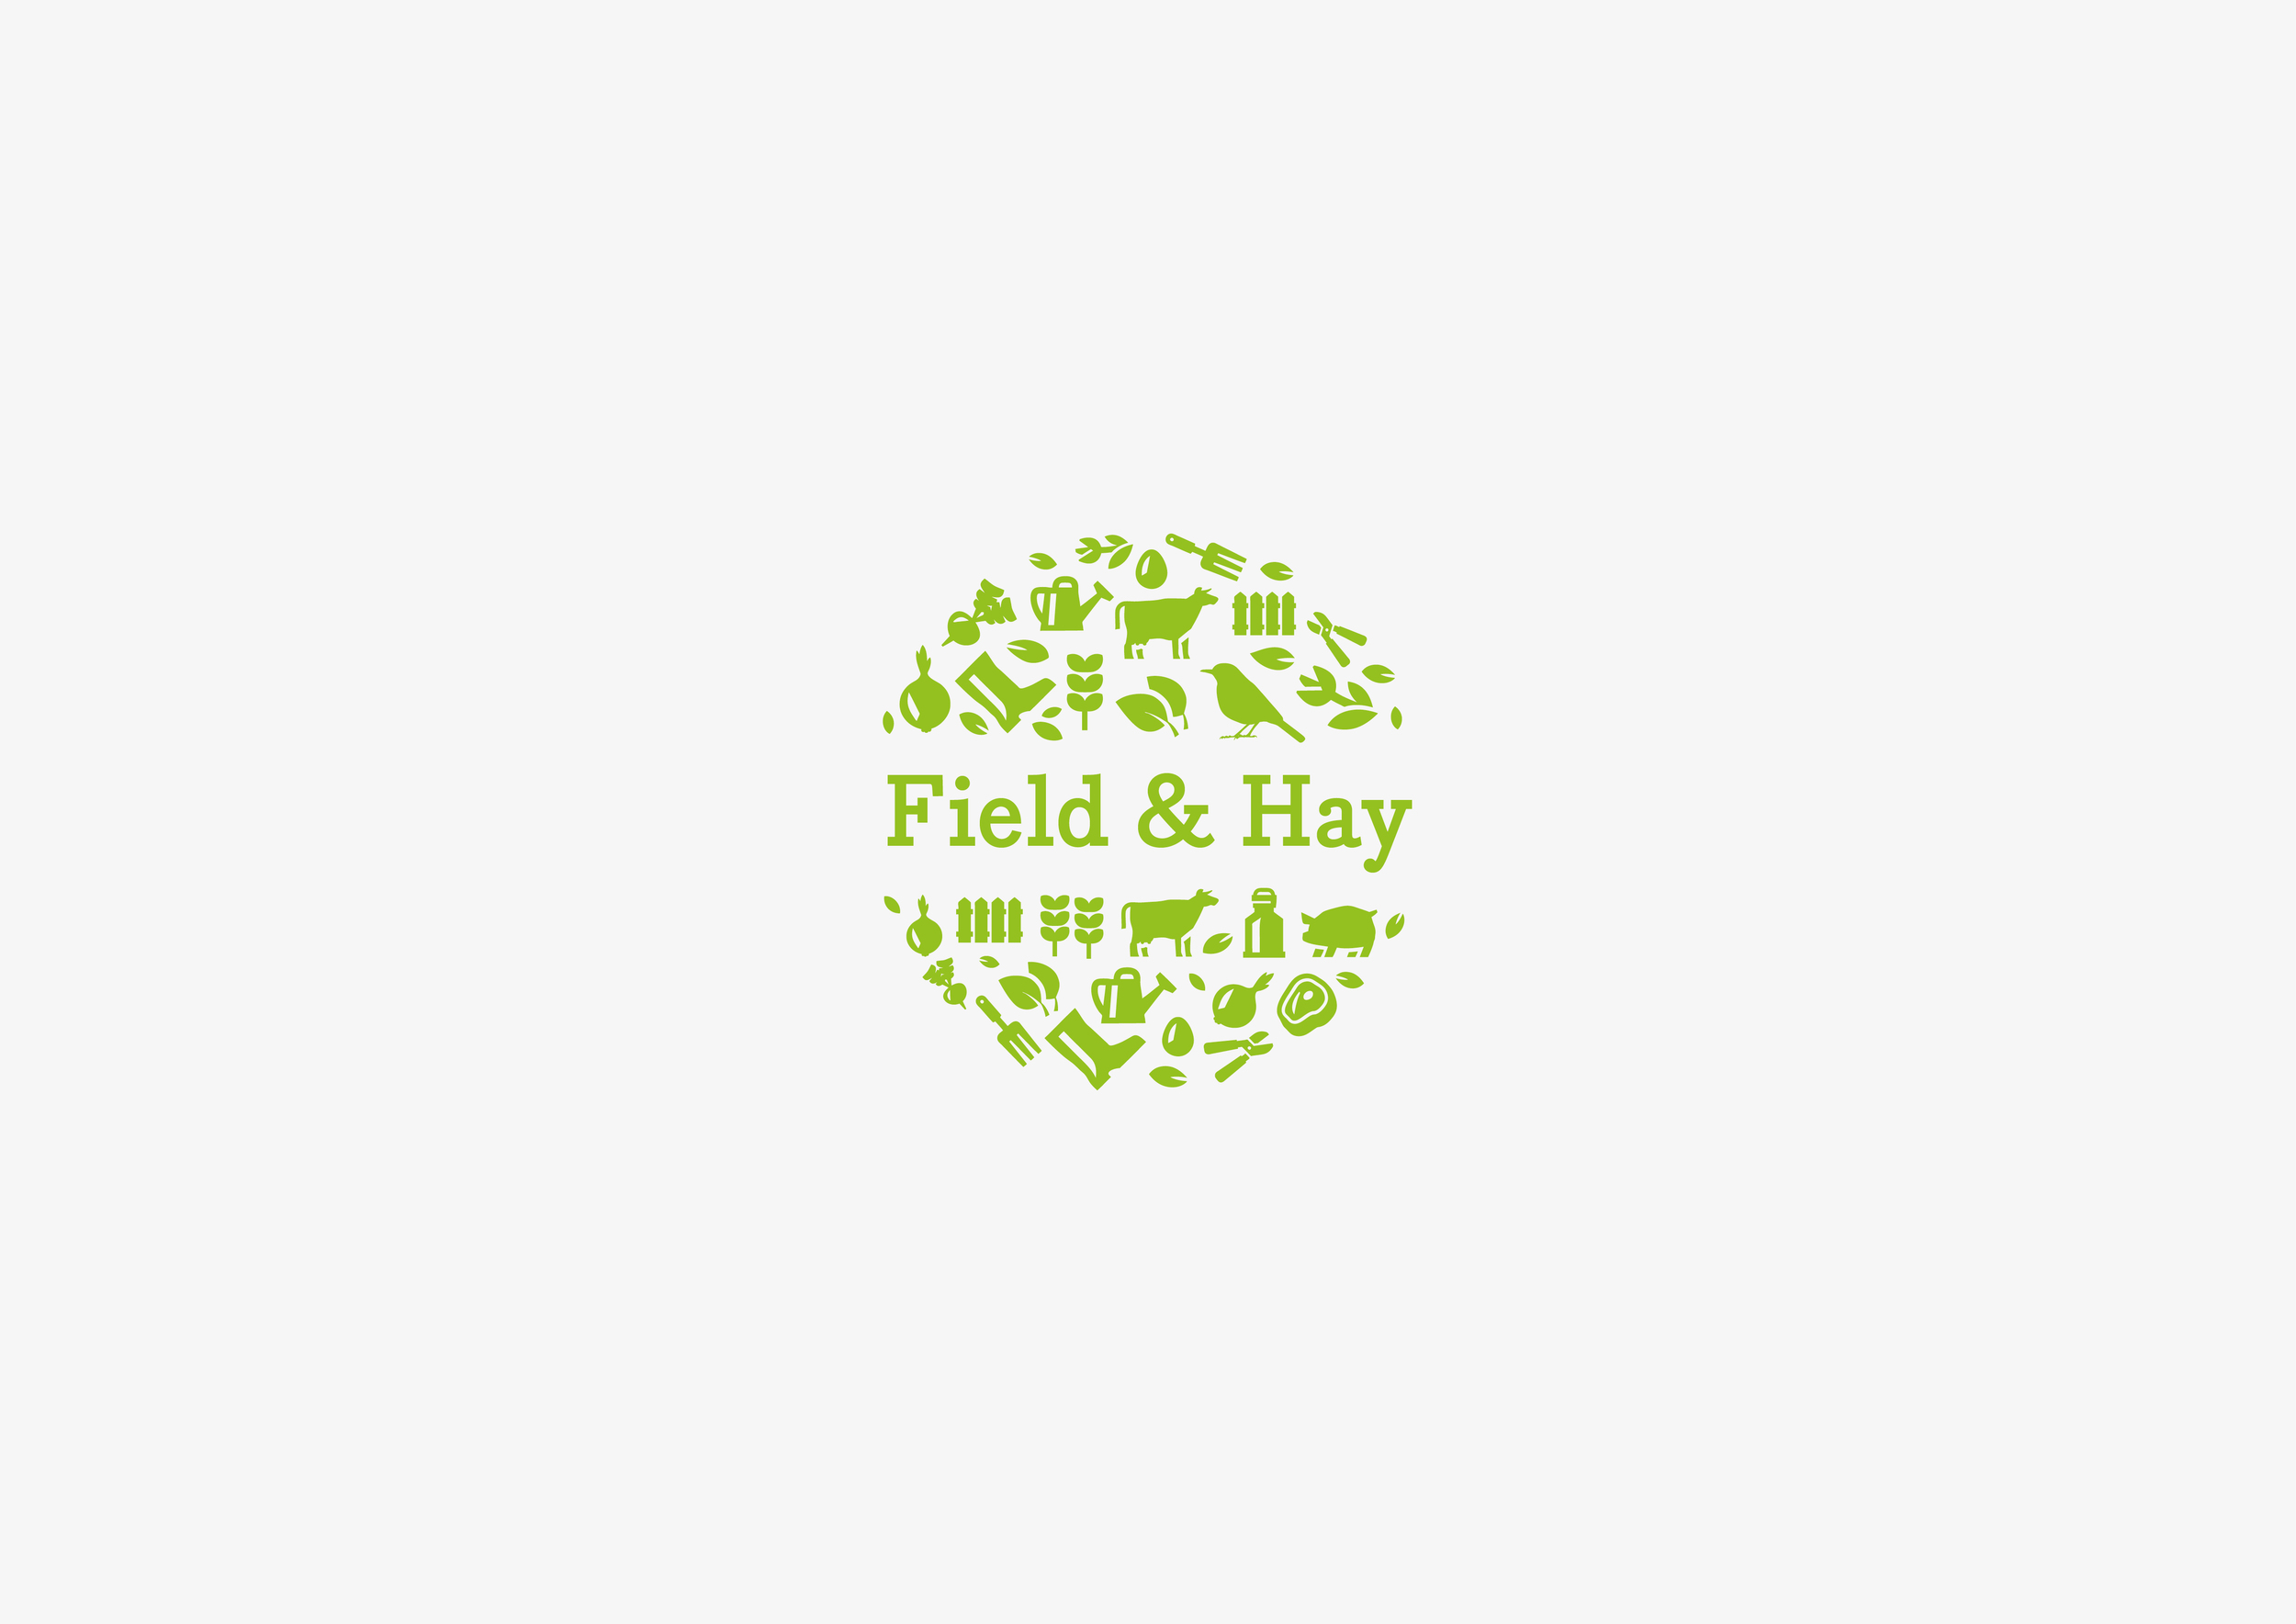 Field and hay logo-01.jpg